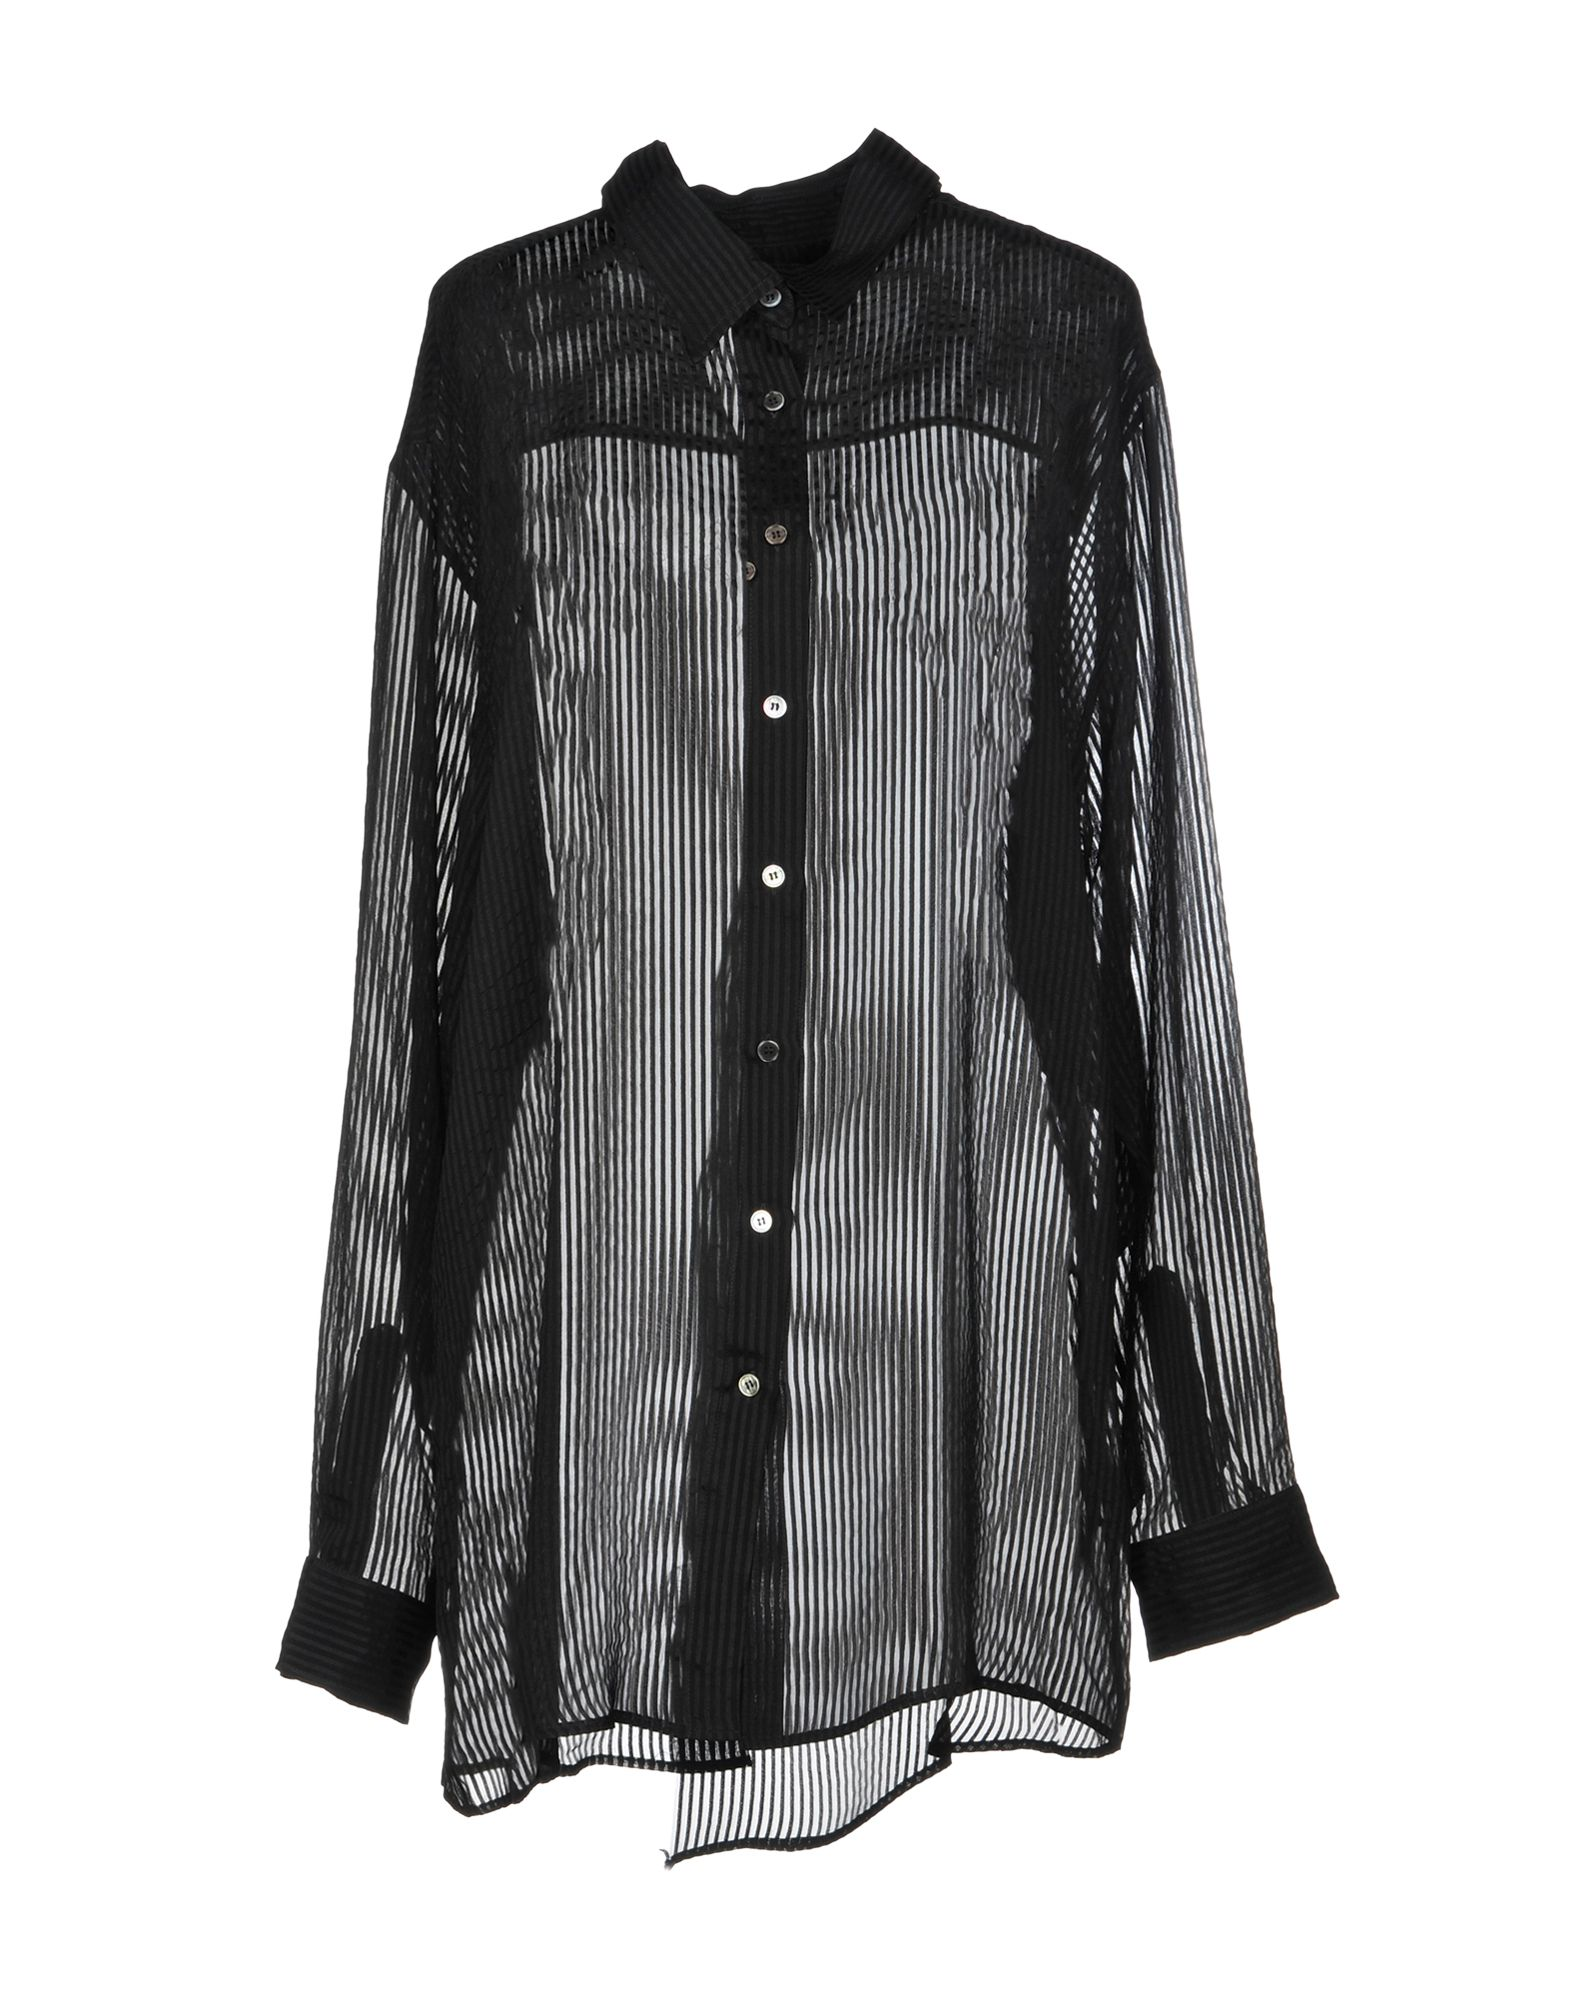 BEN TAVERNITI™ UNRAVEL PROJECT Pубашка ben taverniti™ unravel project блузка